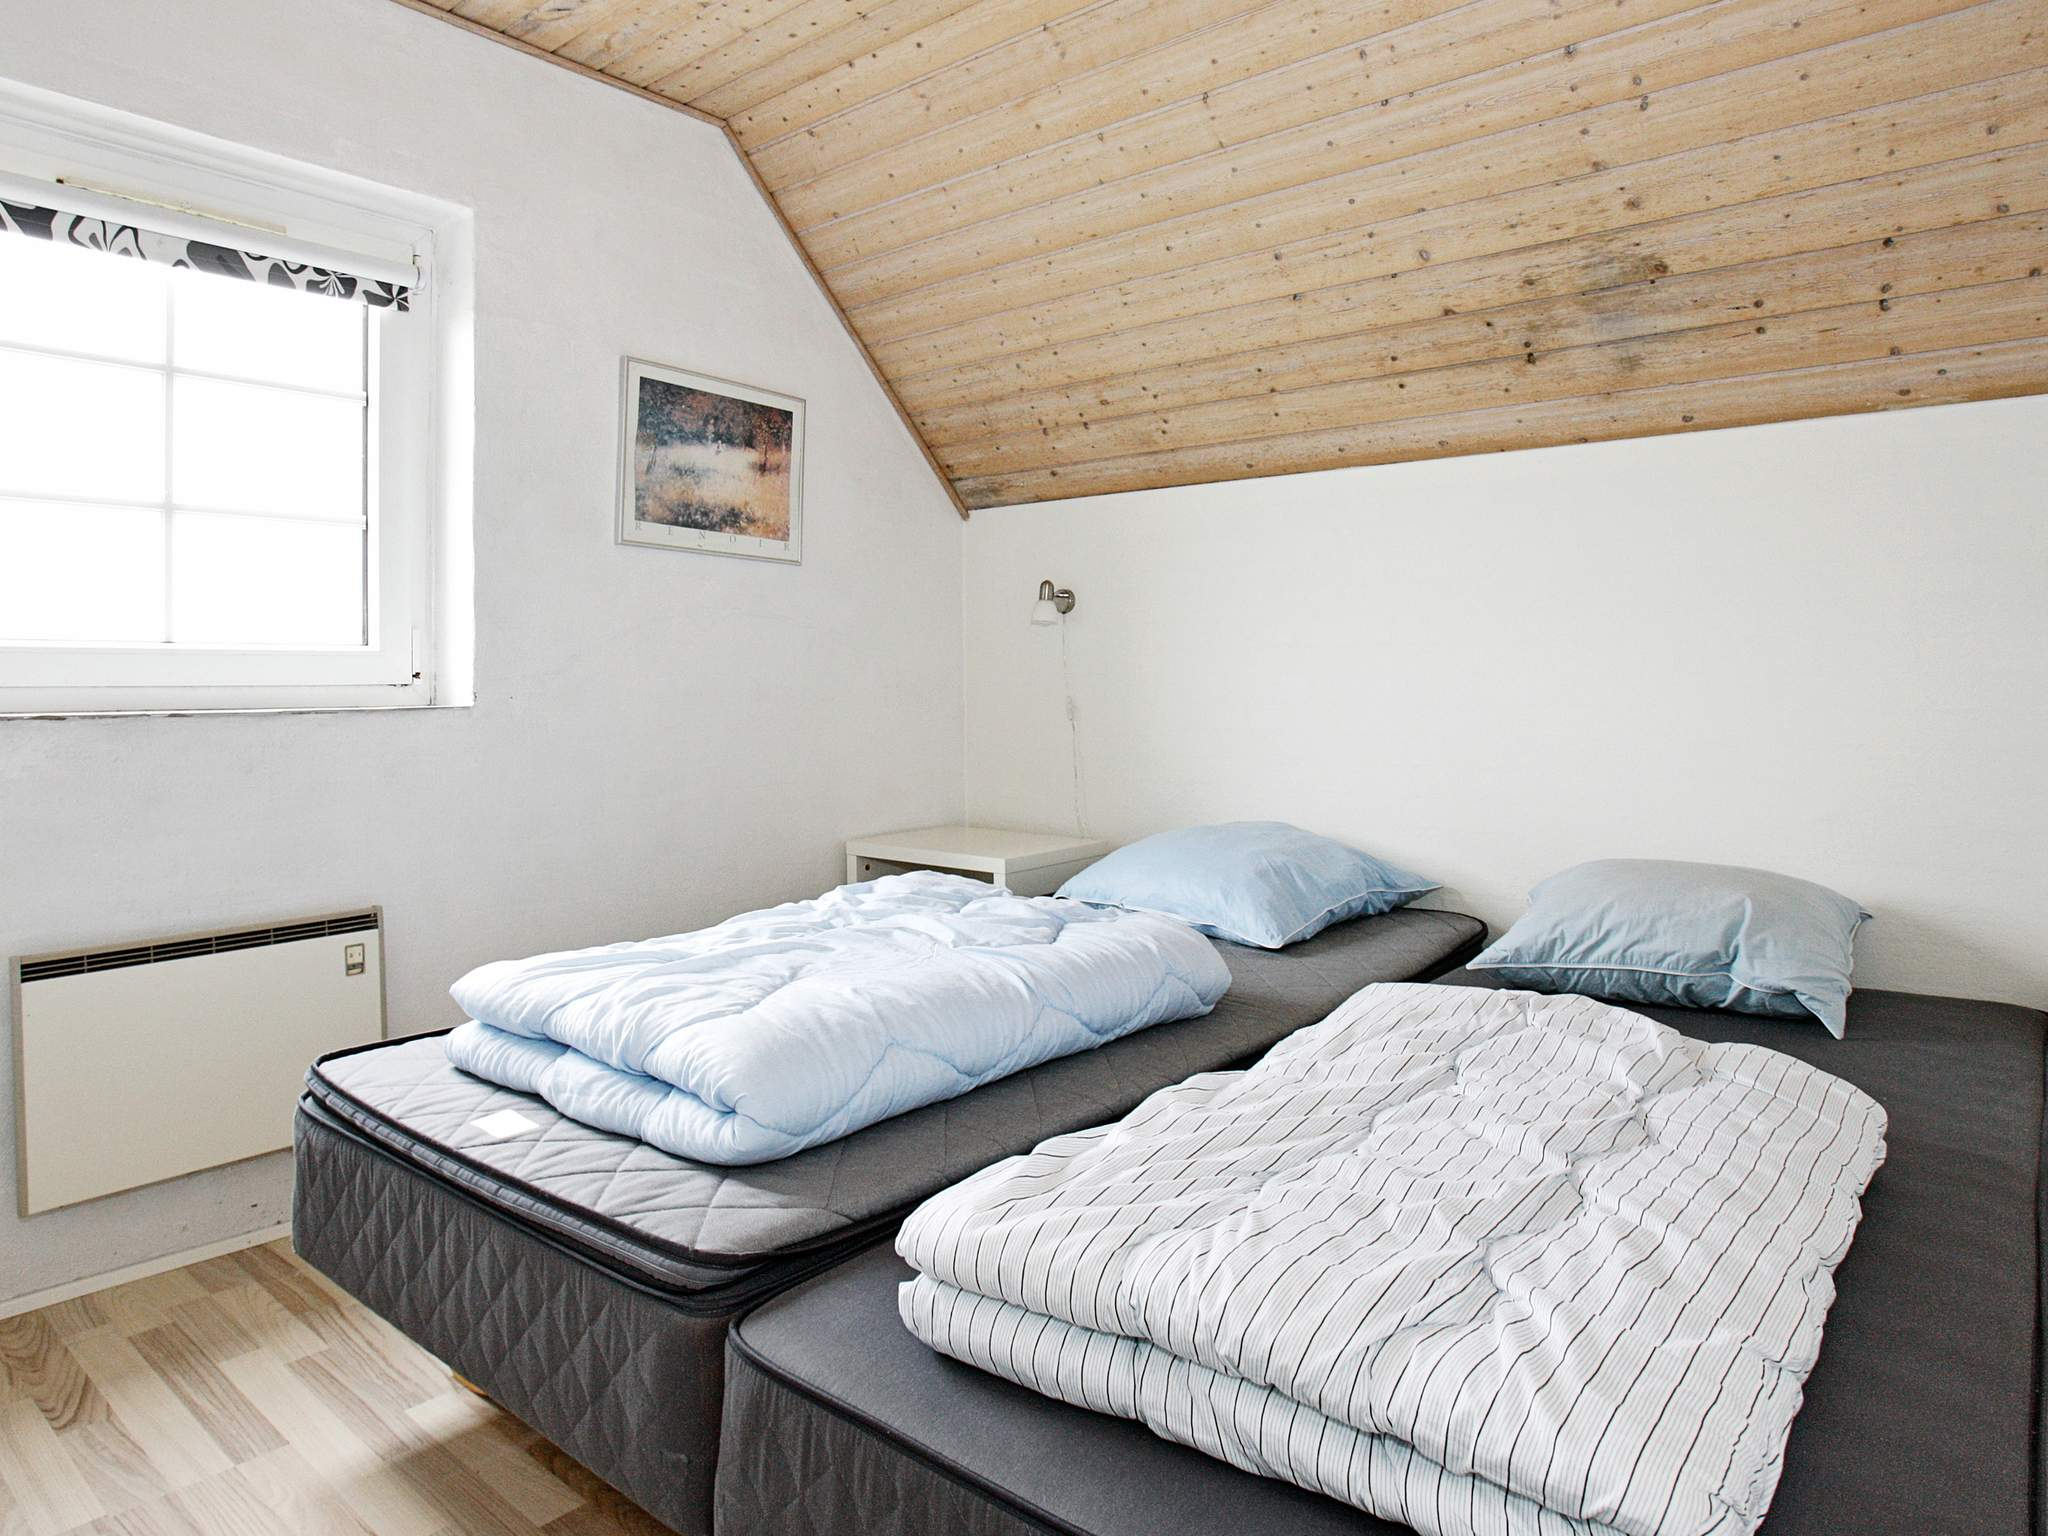 Ferienhaus Vrist (88916), Vrist, , Limfjord, Dänemark, Bild 9